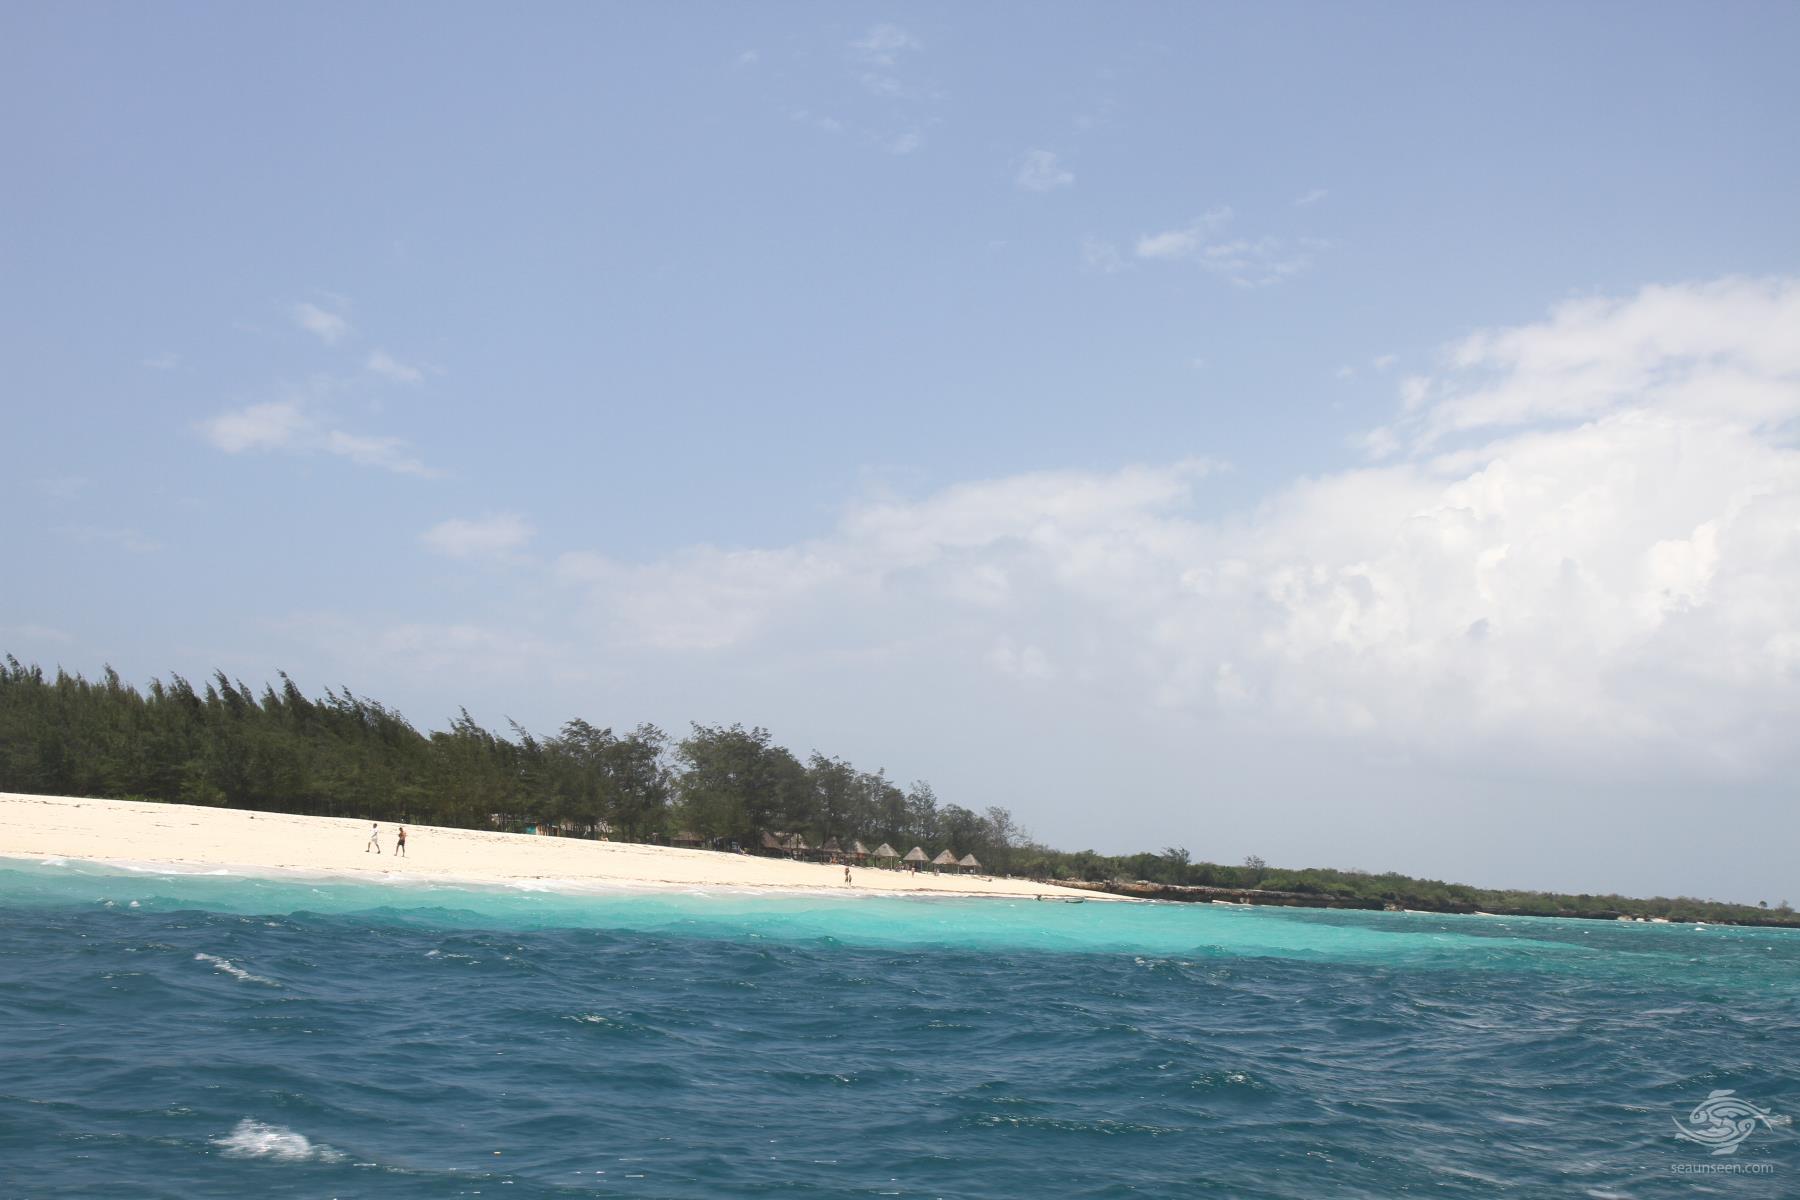 Mbudya Island dar es Salaam Tanzania